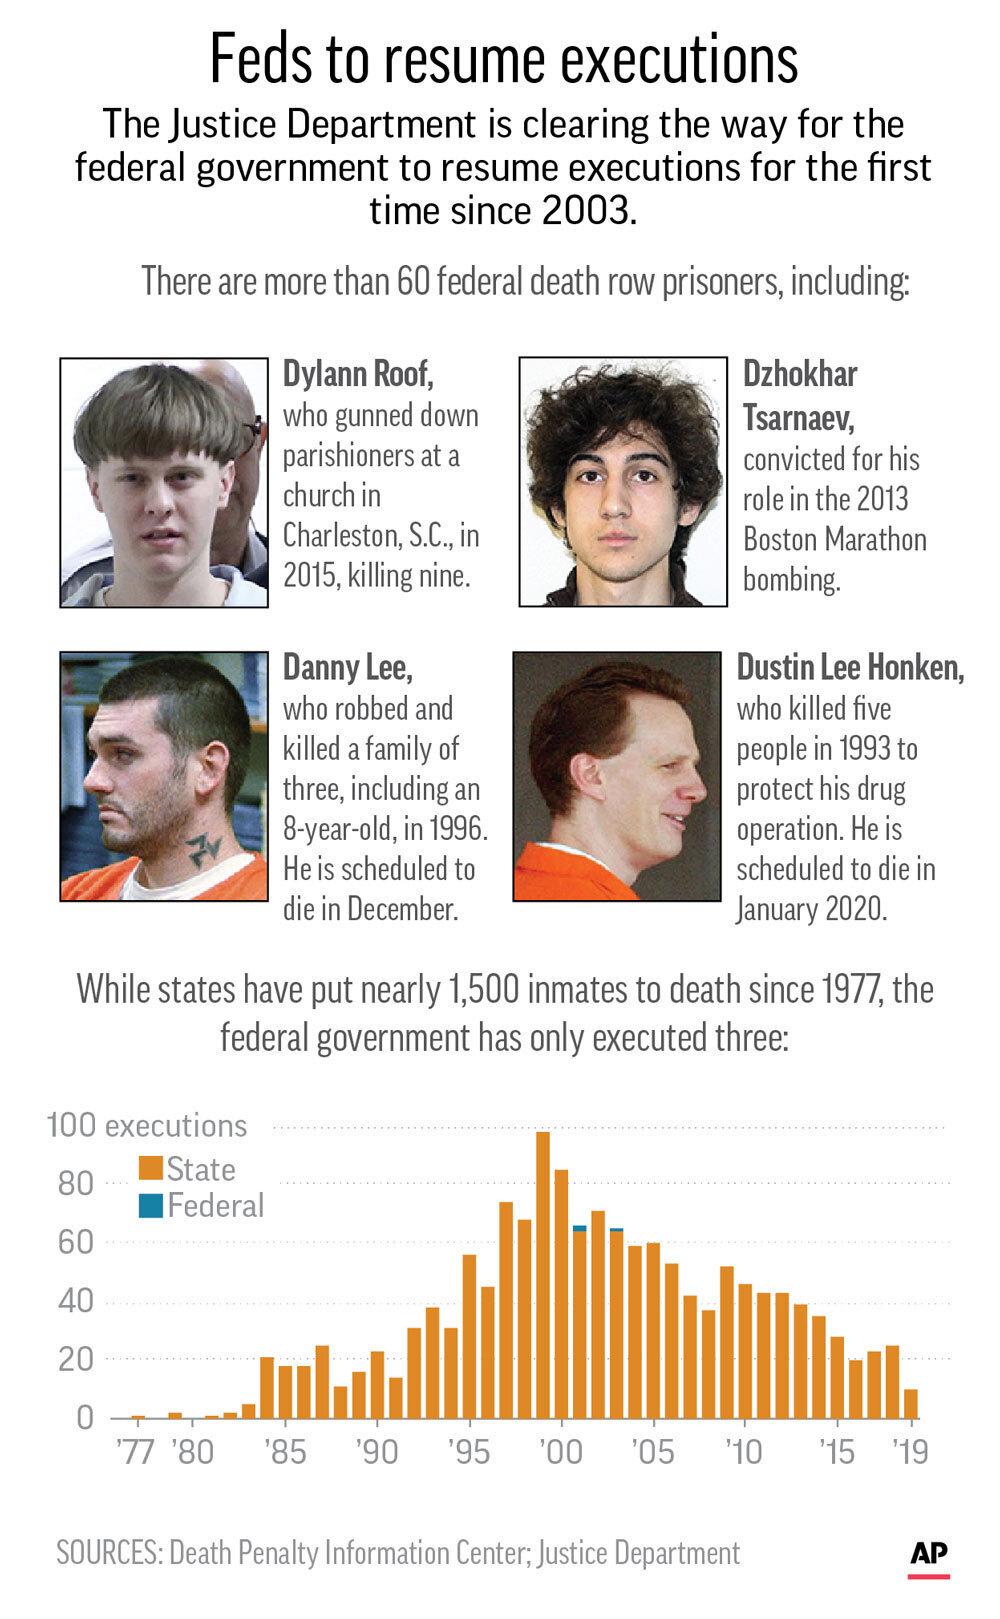 A look at the 5 federal death row inmates facing execution